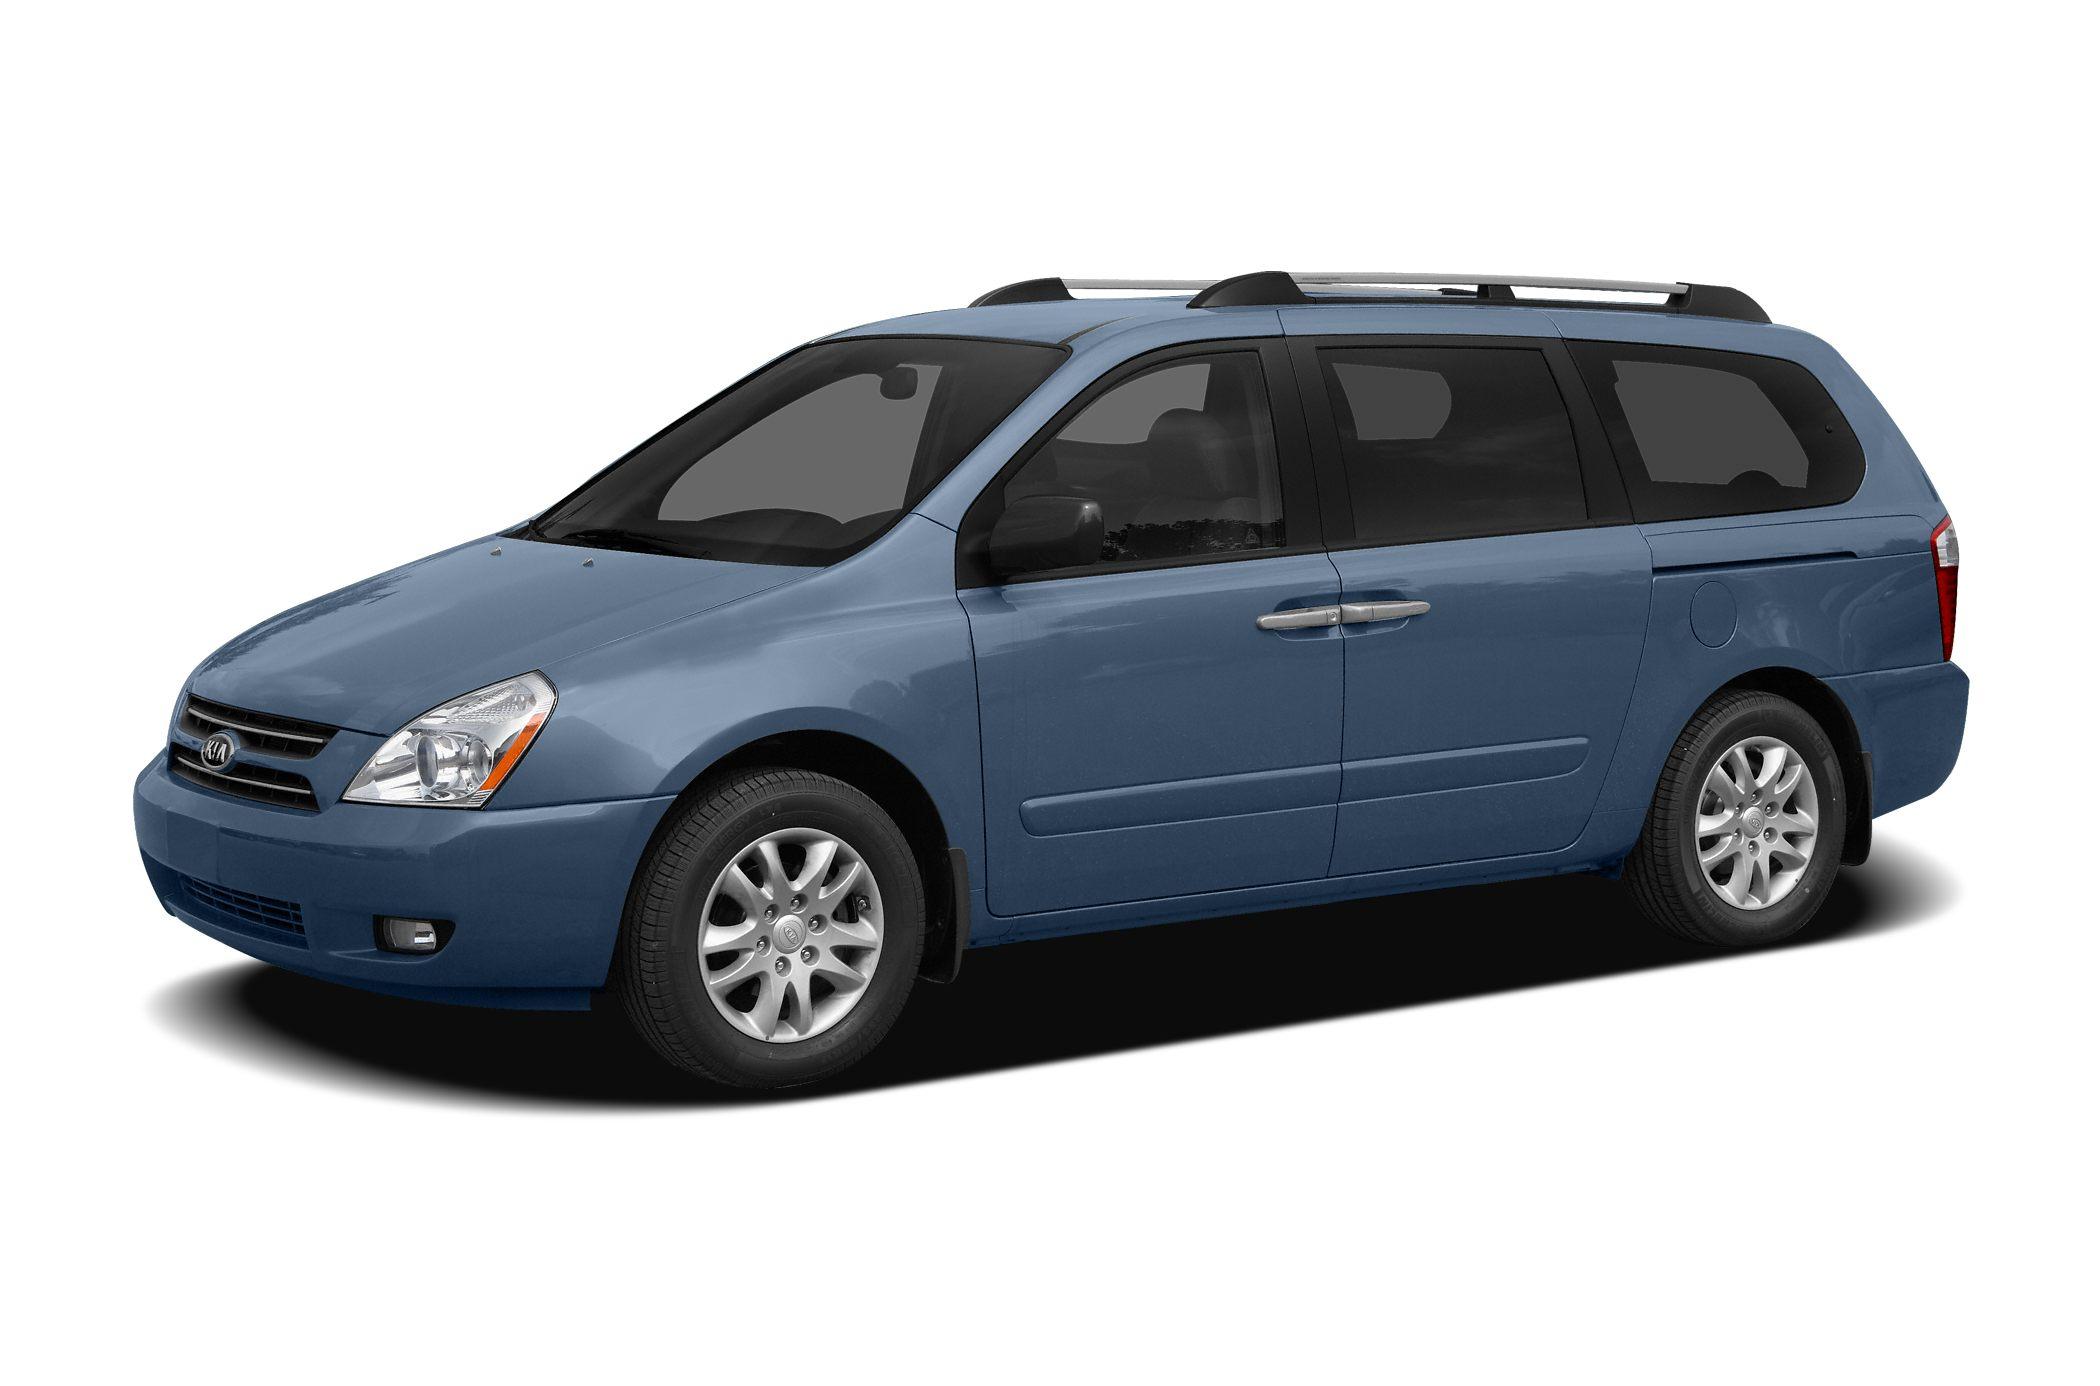 2009 Kia Sedona Minivan for sale in Killeen for $7,990 with 110,906 miles.